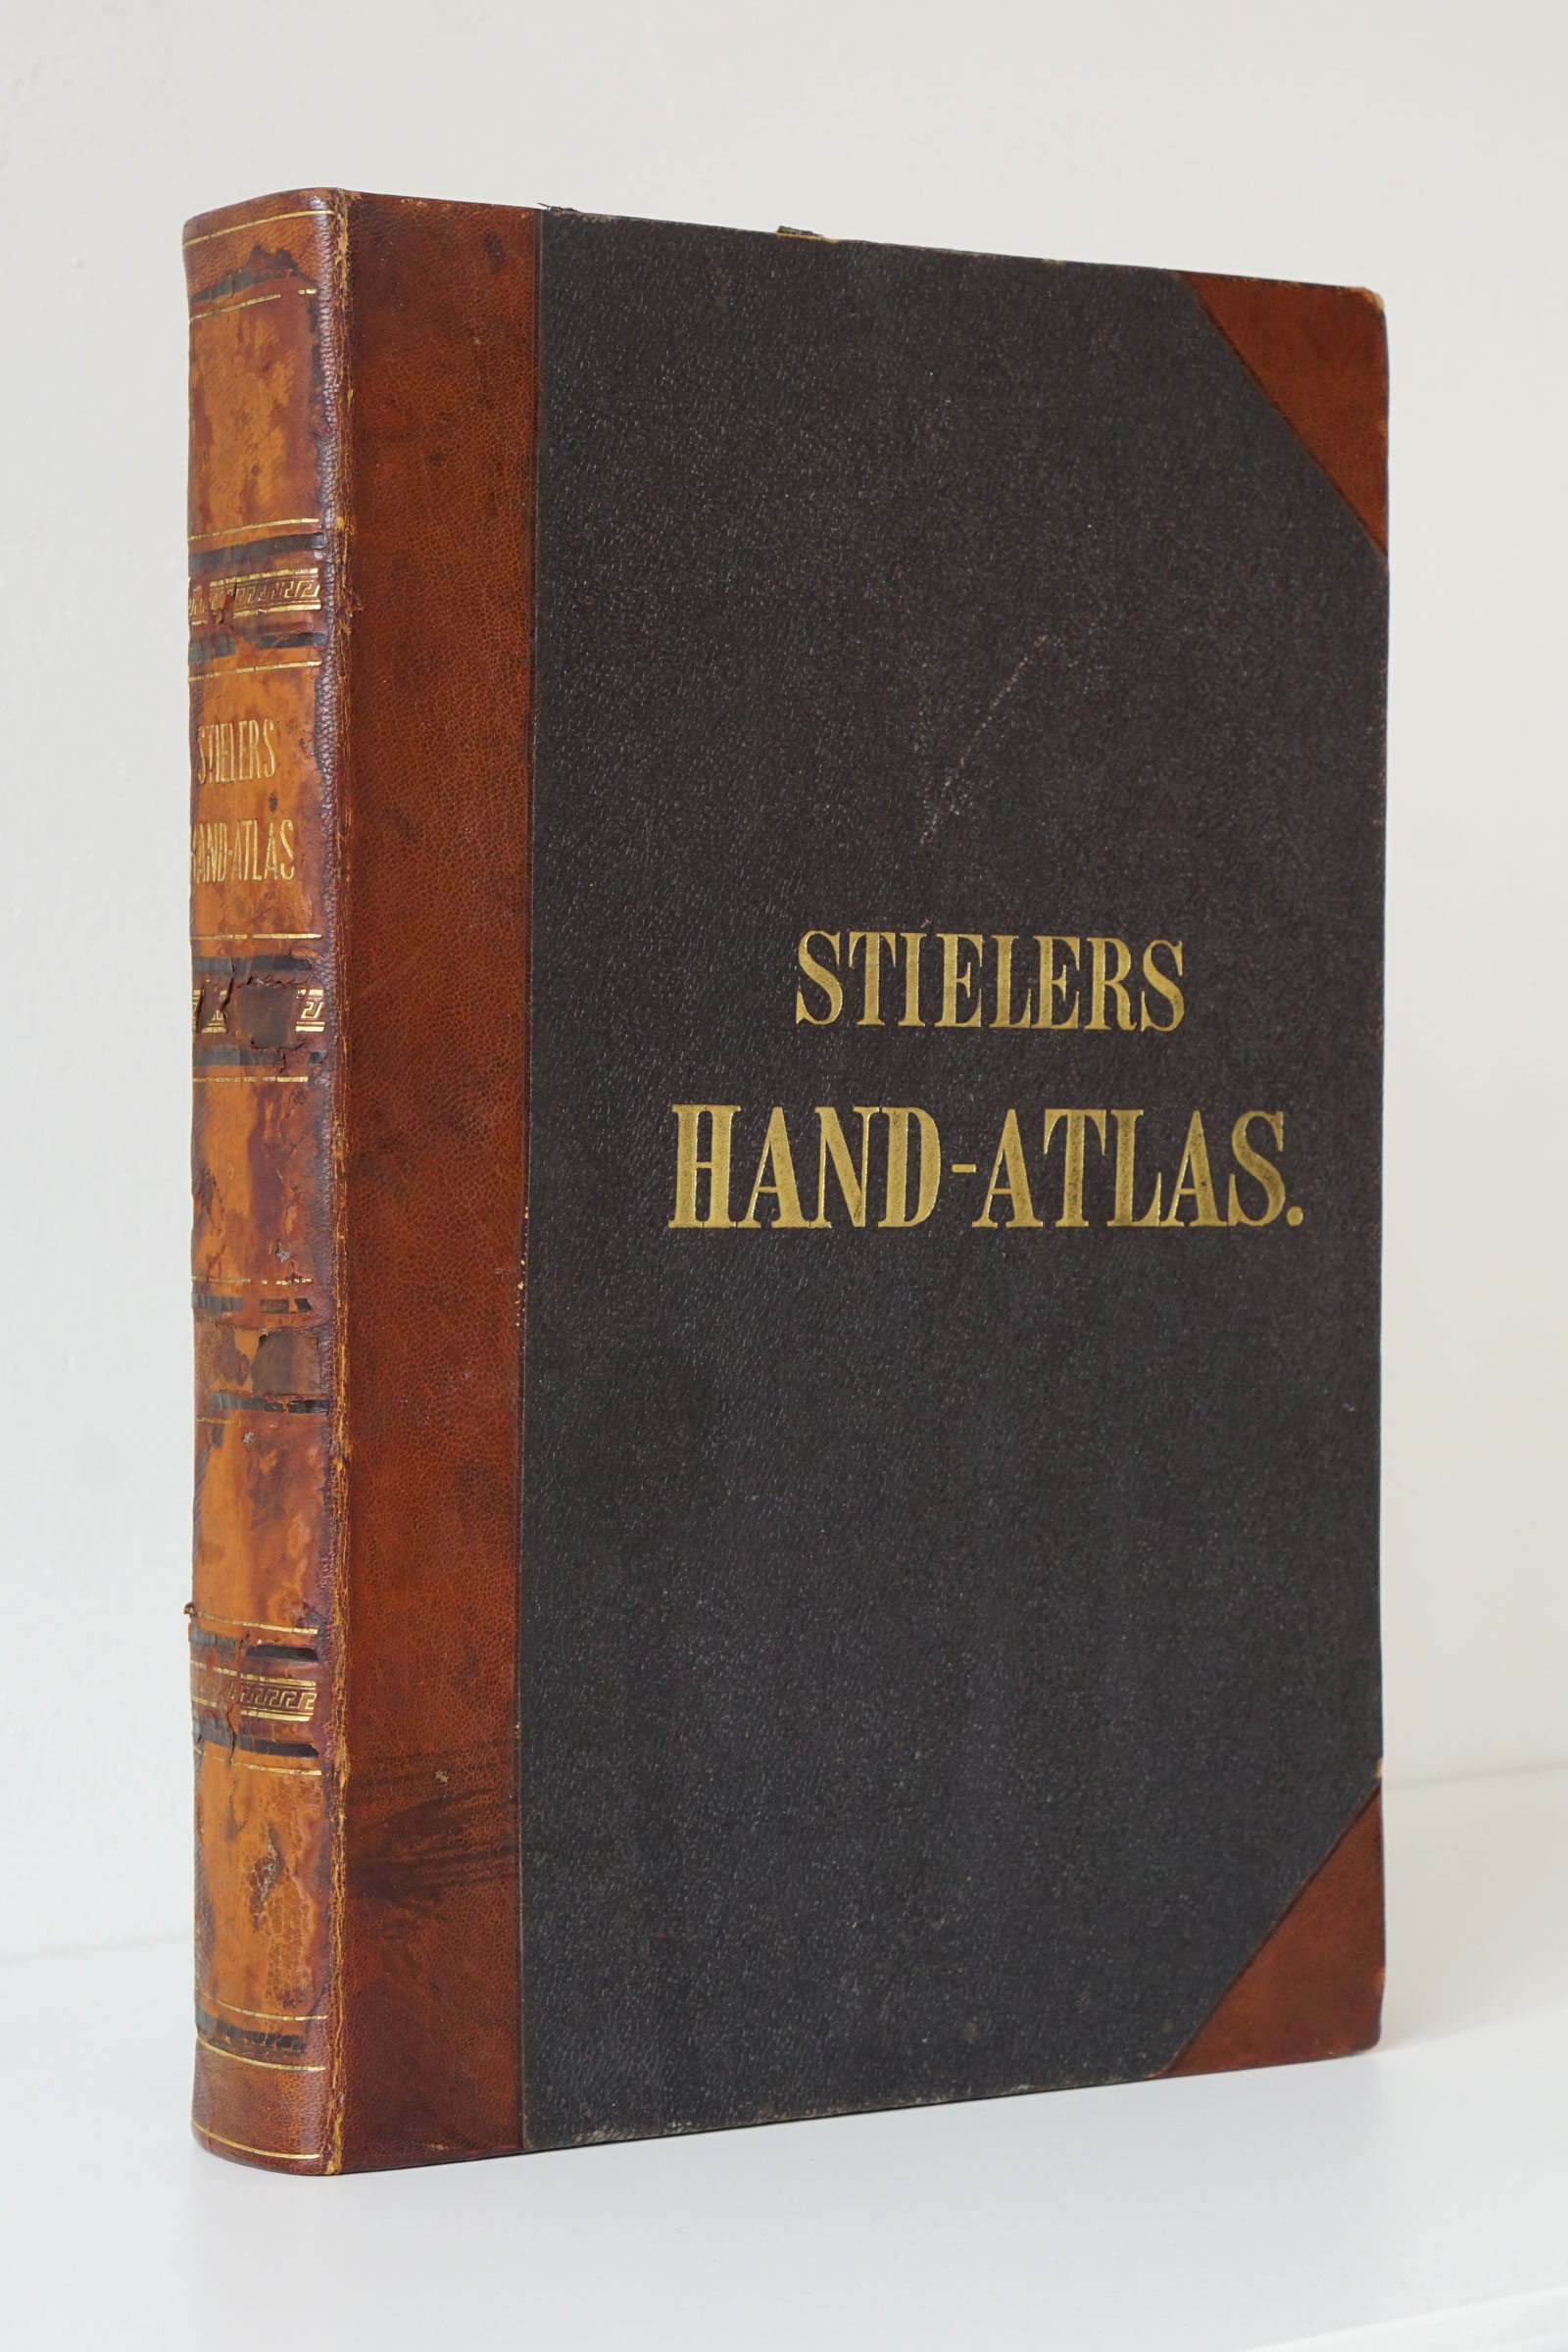 Stielers Handatlas, 8th edition